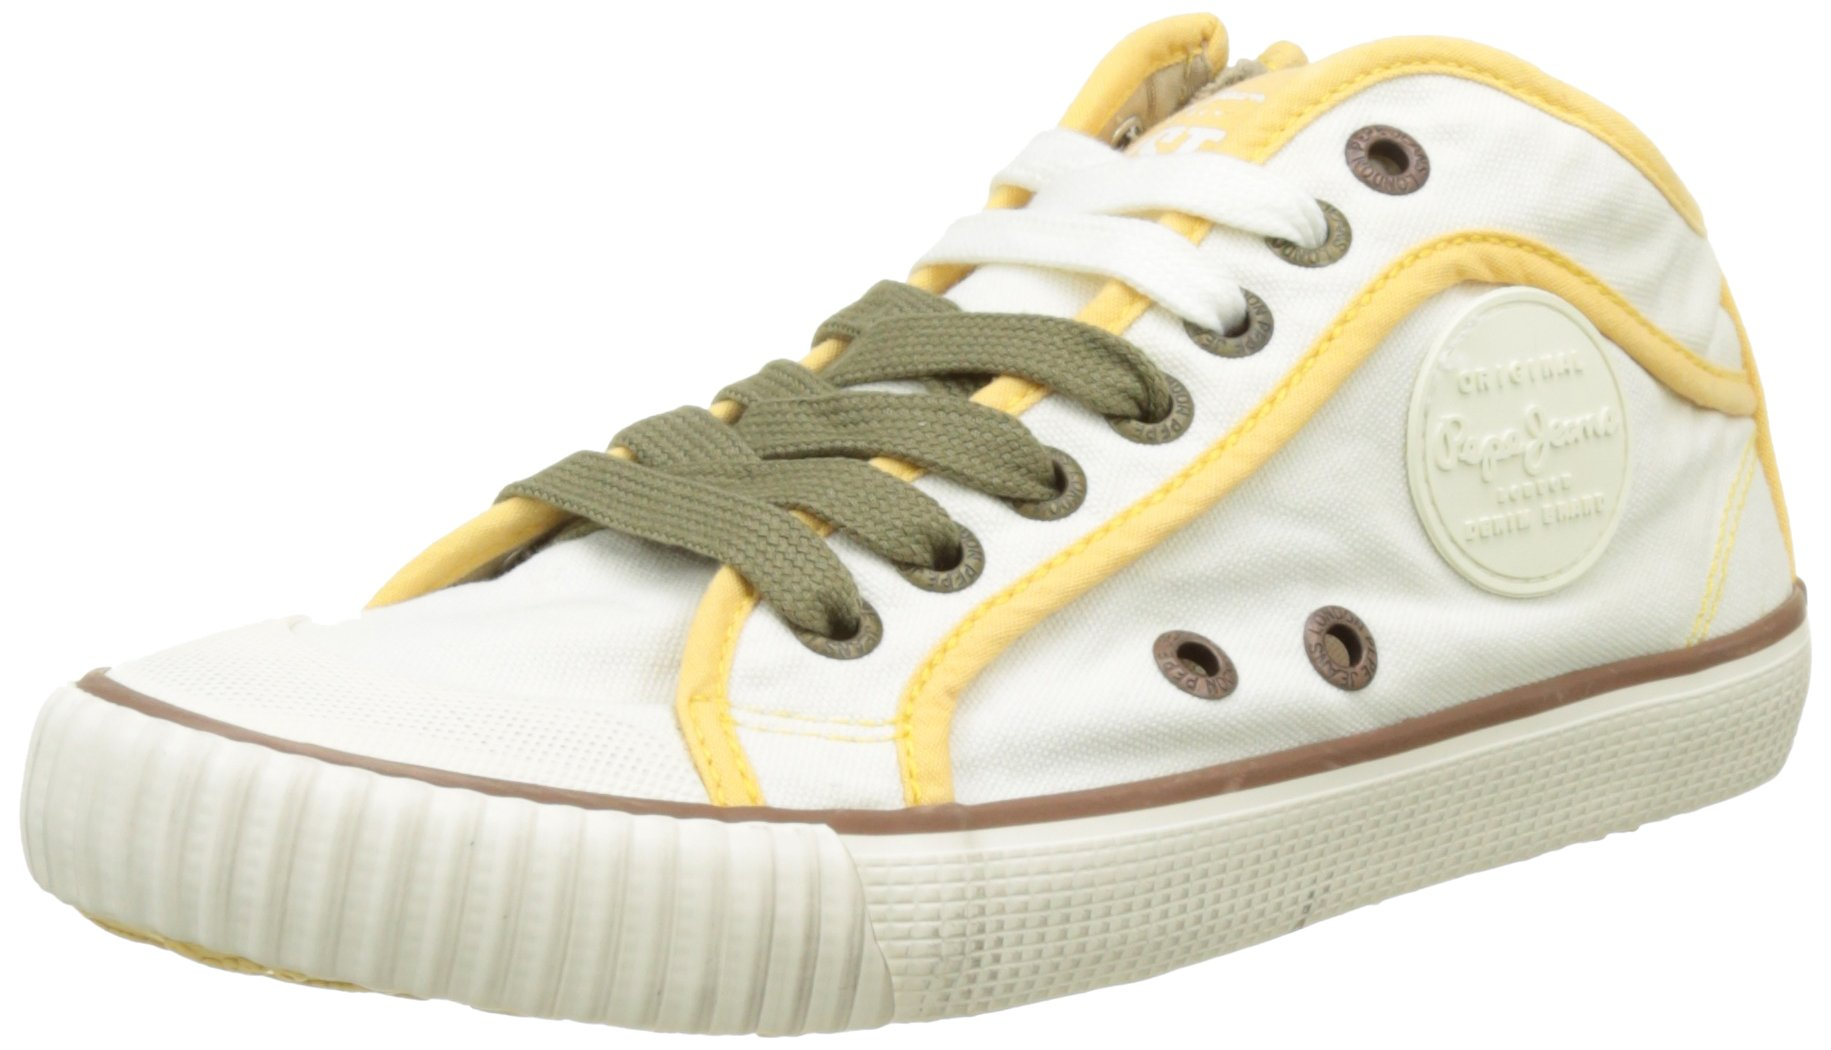 Pepe LondonSneakers FemmeBlancoff Jeans Basses White37eu tsQrdCh